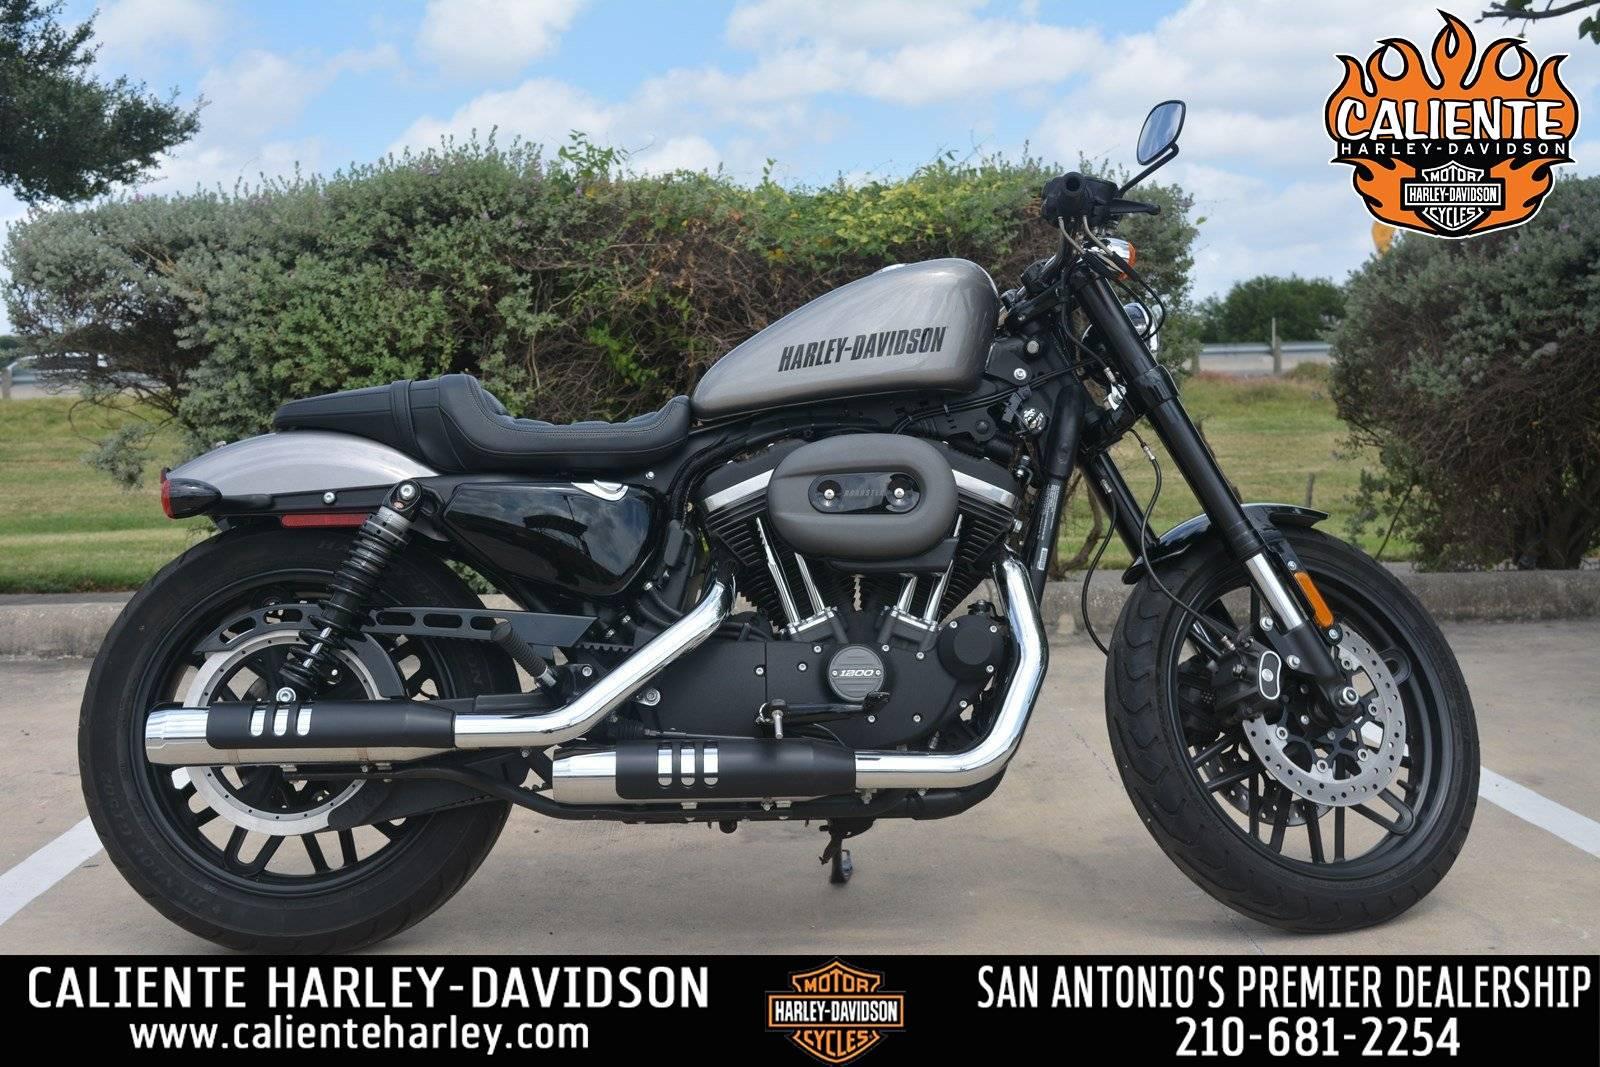 Harley Davidson Roadster Custom Cheap Online